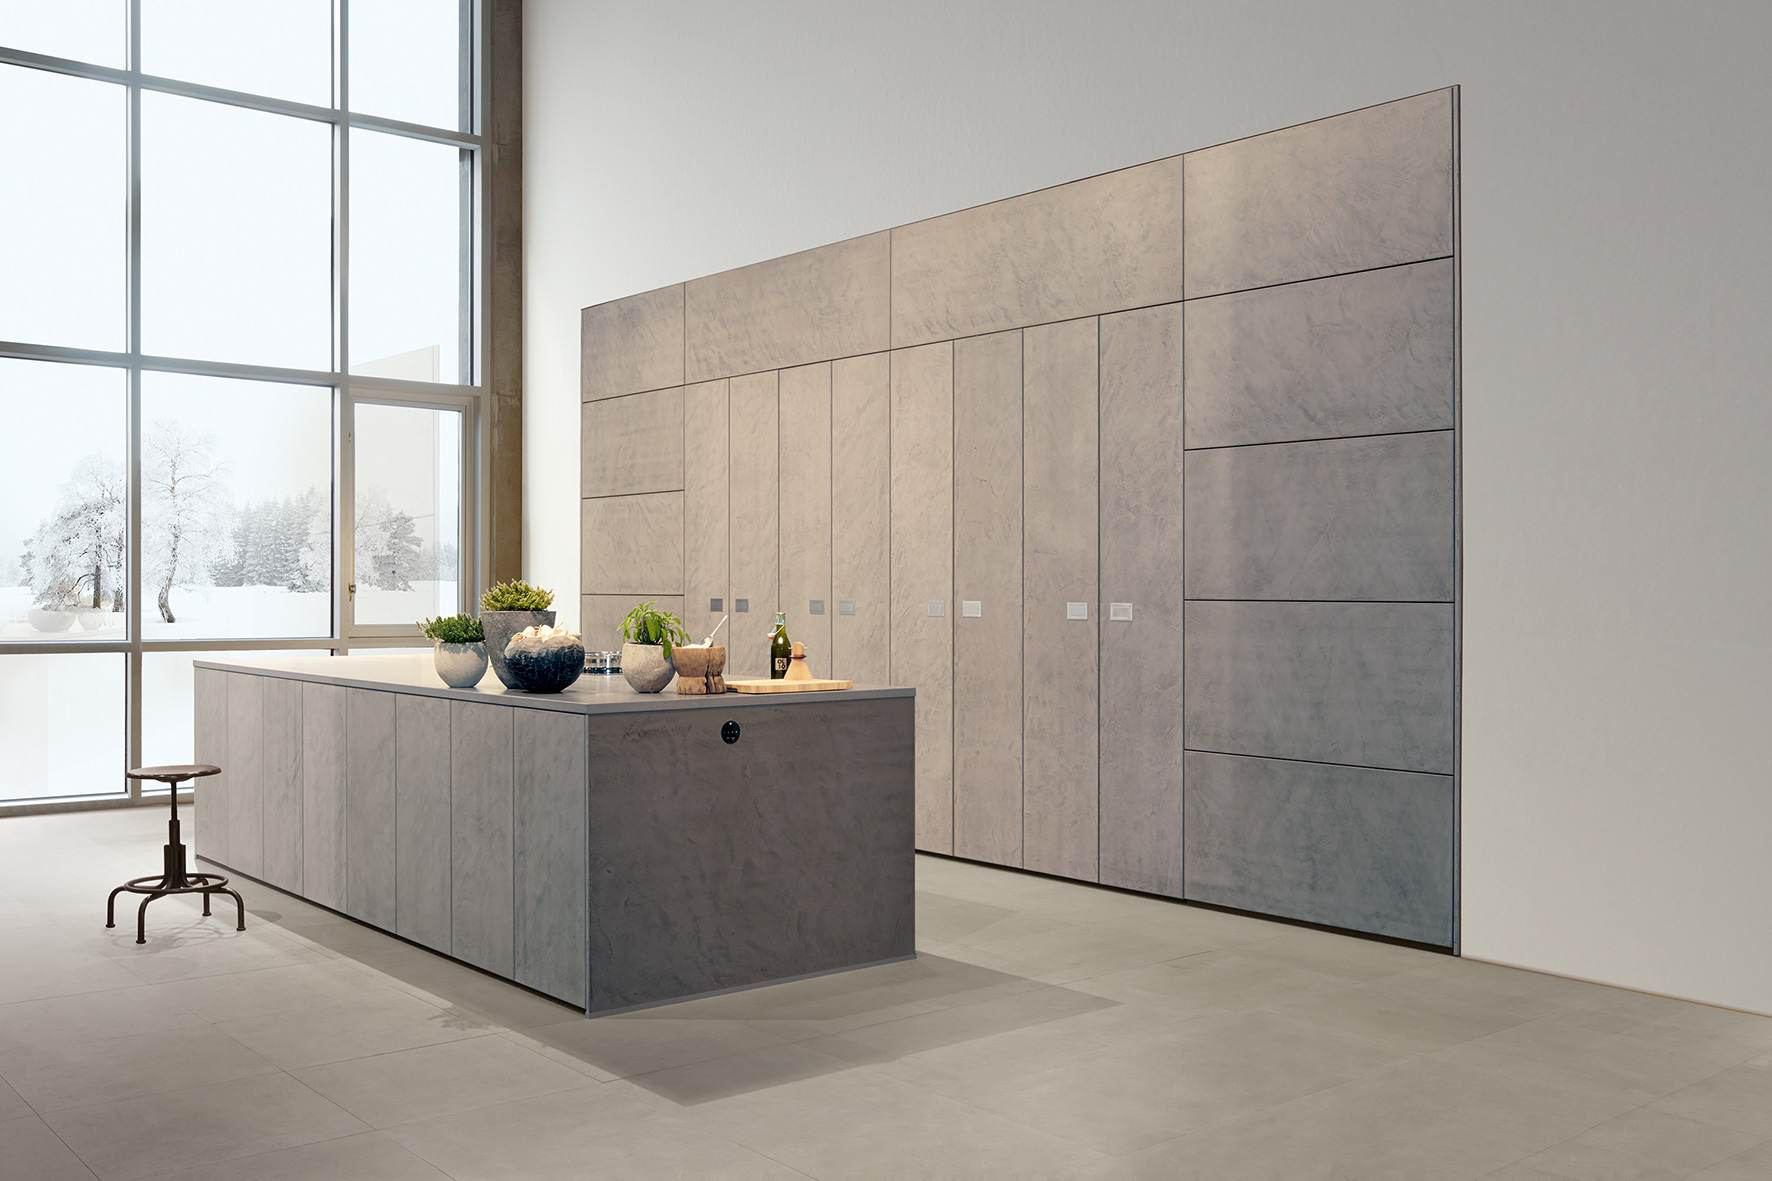 zeyko k chen herzer. Black Bedroom Furniture Sets. Home Design Ideas